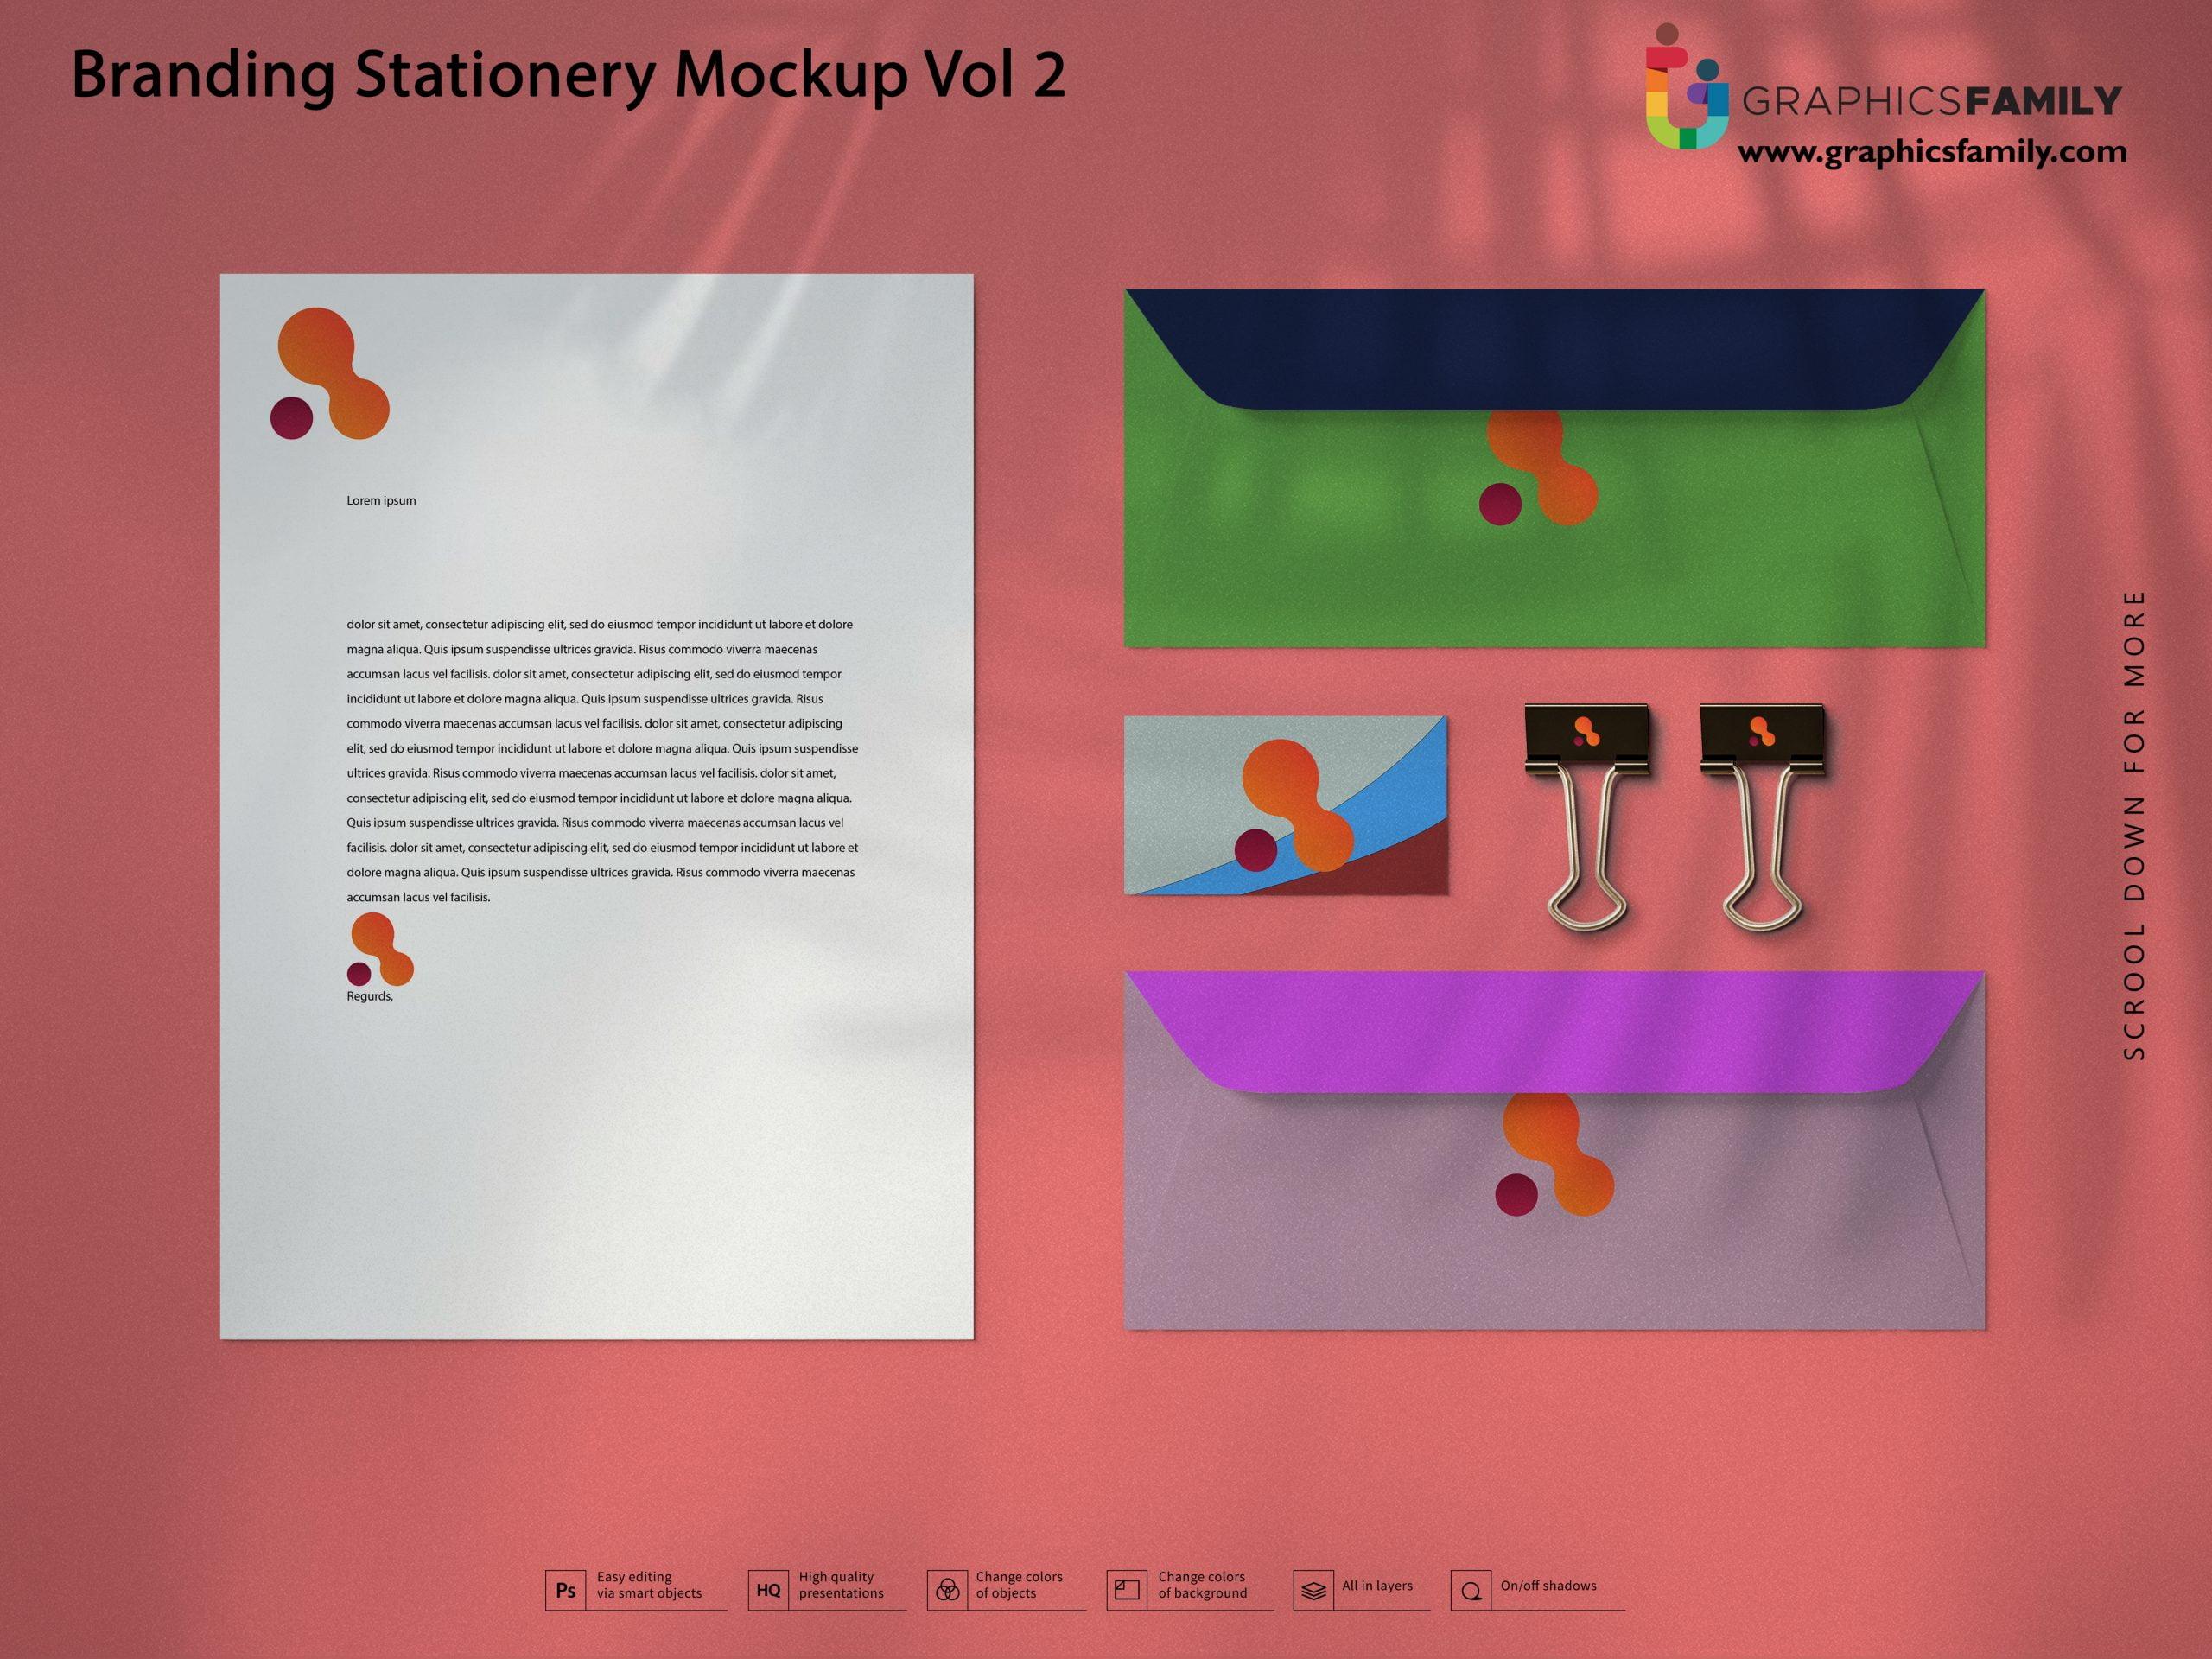 Free Impressive Branding Stationery Mockup Free PSD Download